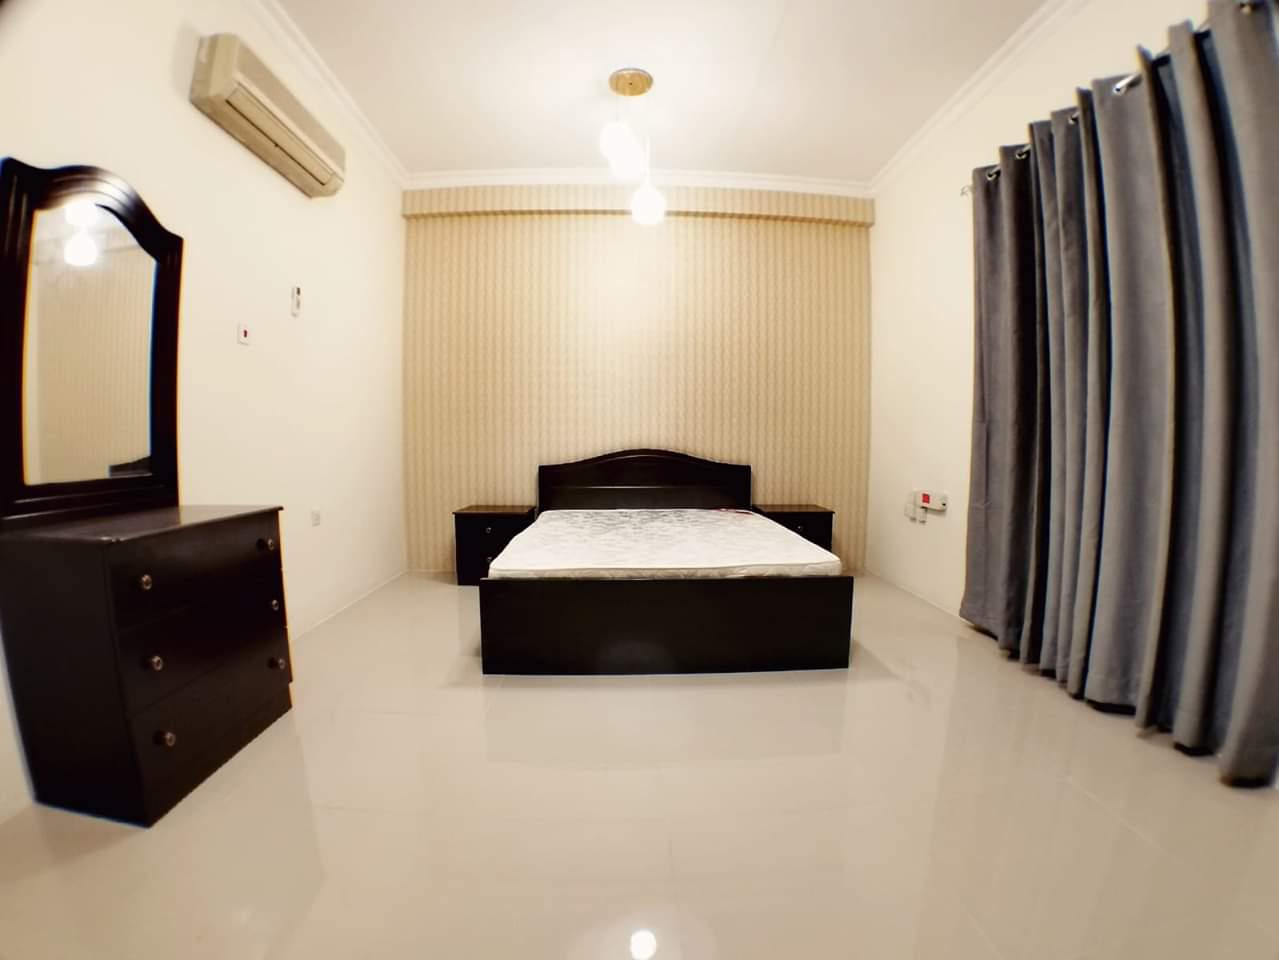 Exicute Bachelor Bed Space for Hindi Urdu Speaking | Qatar